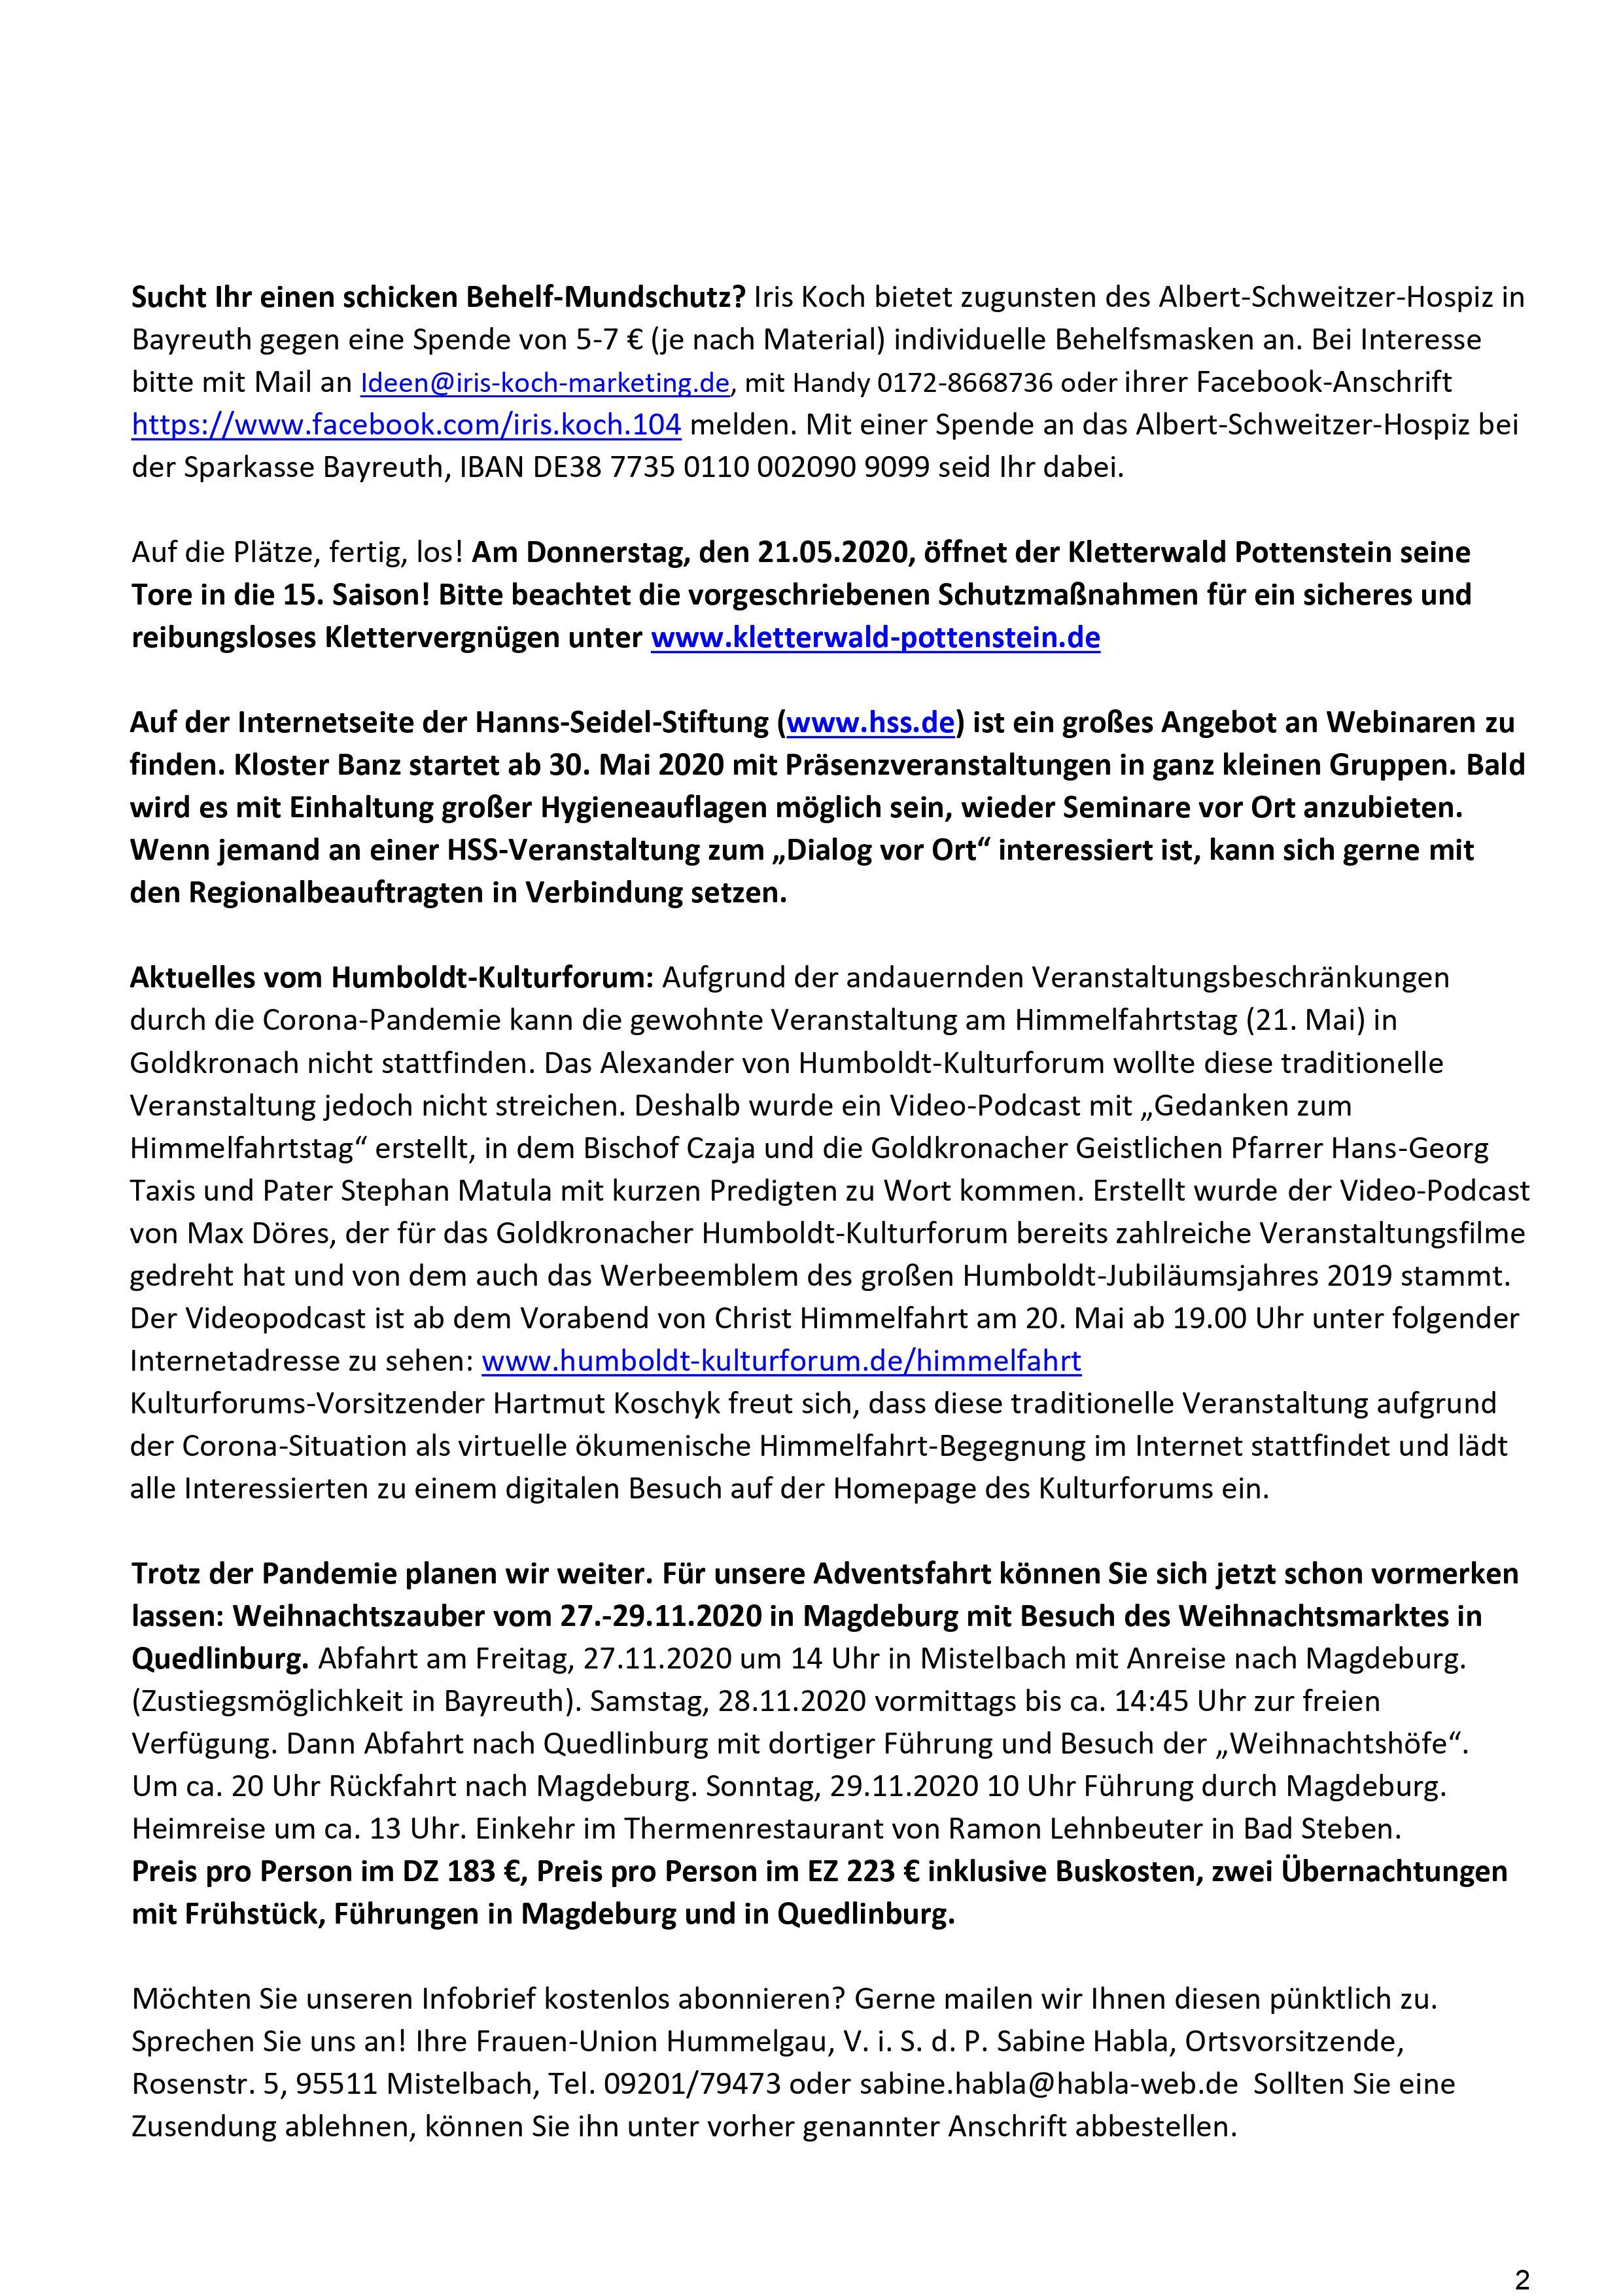 Infobrief Mai-Juni 2020 - Frauenunion Hummelgau 2